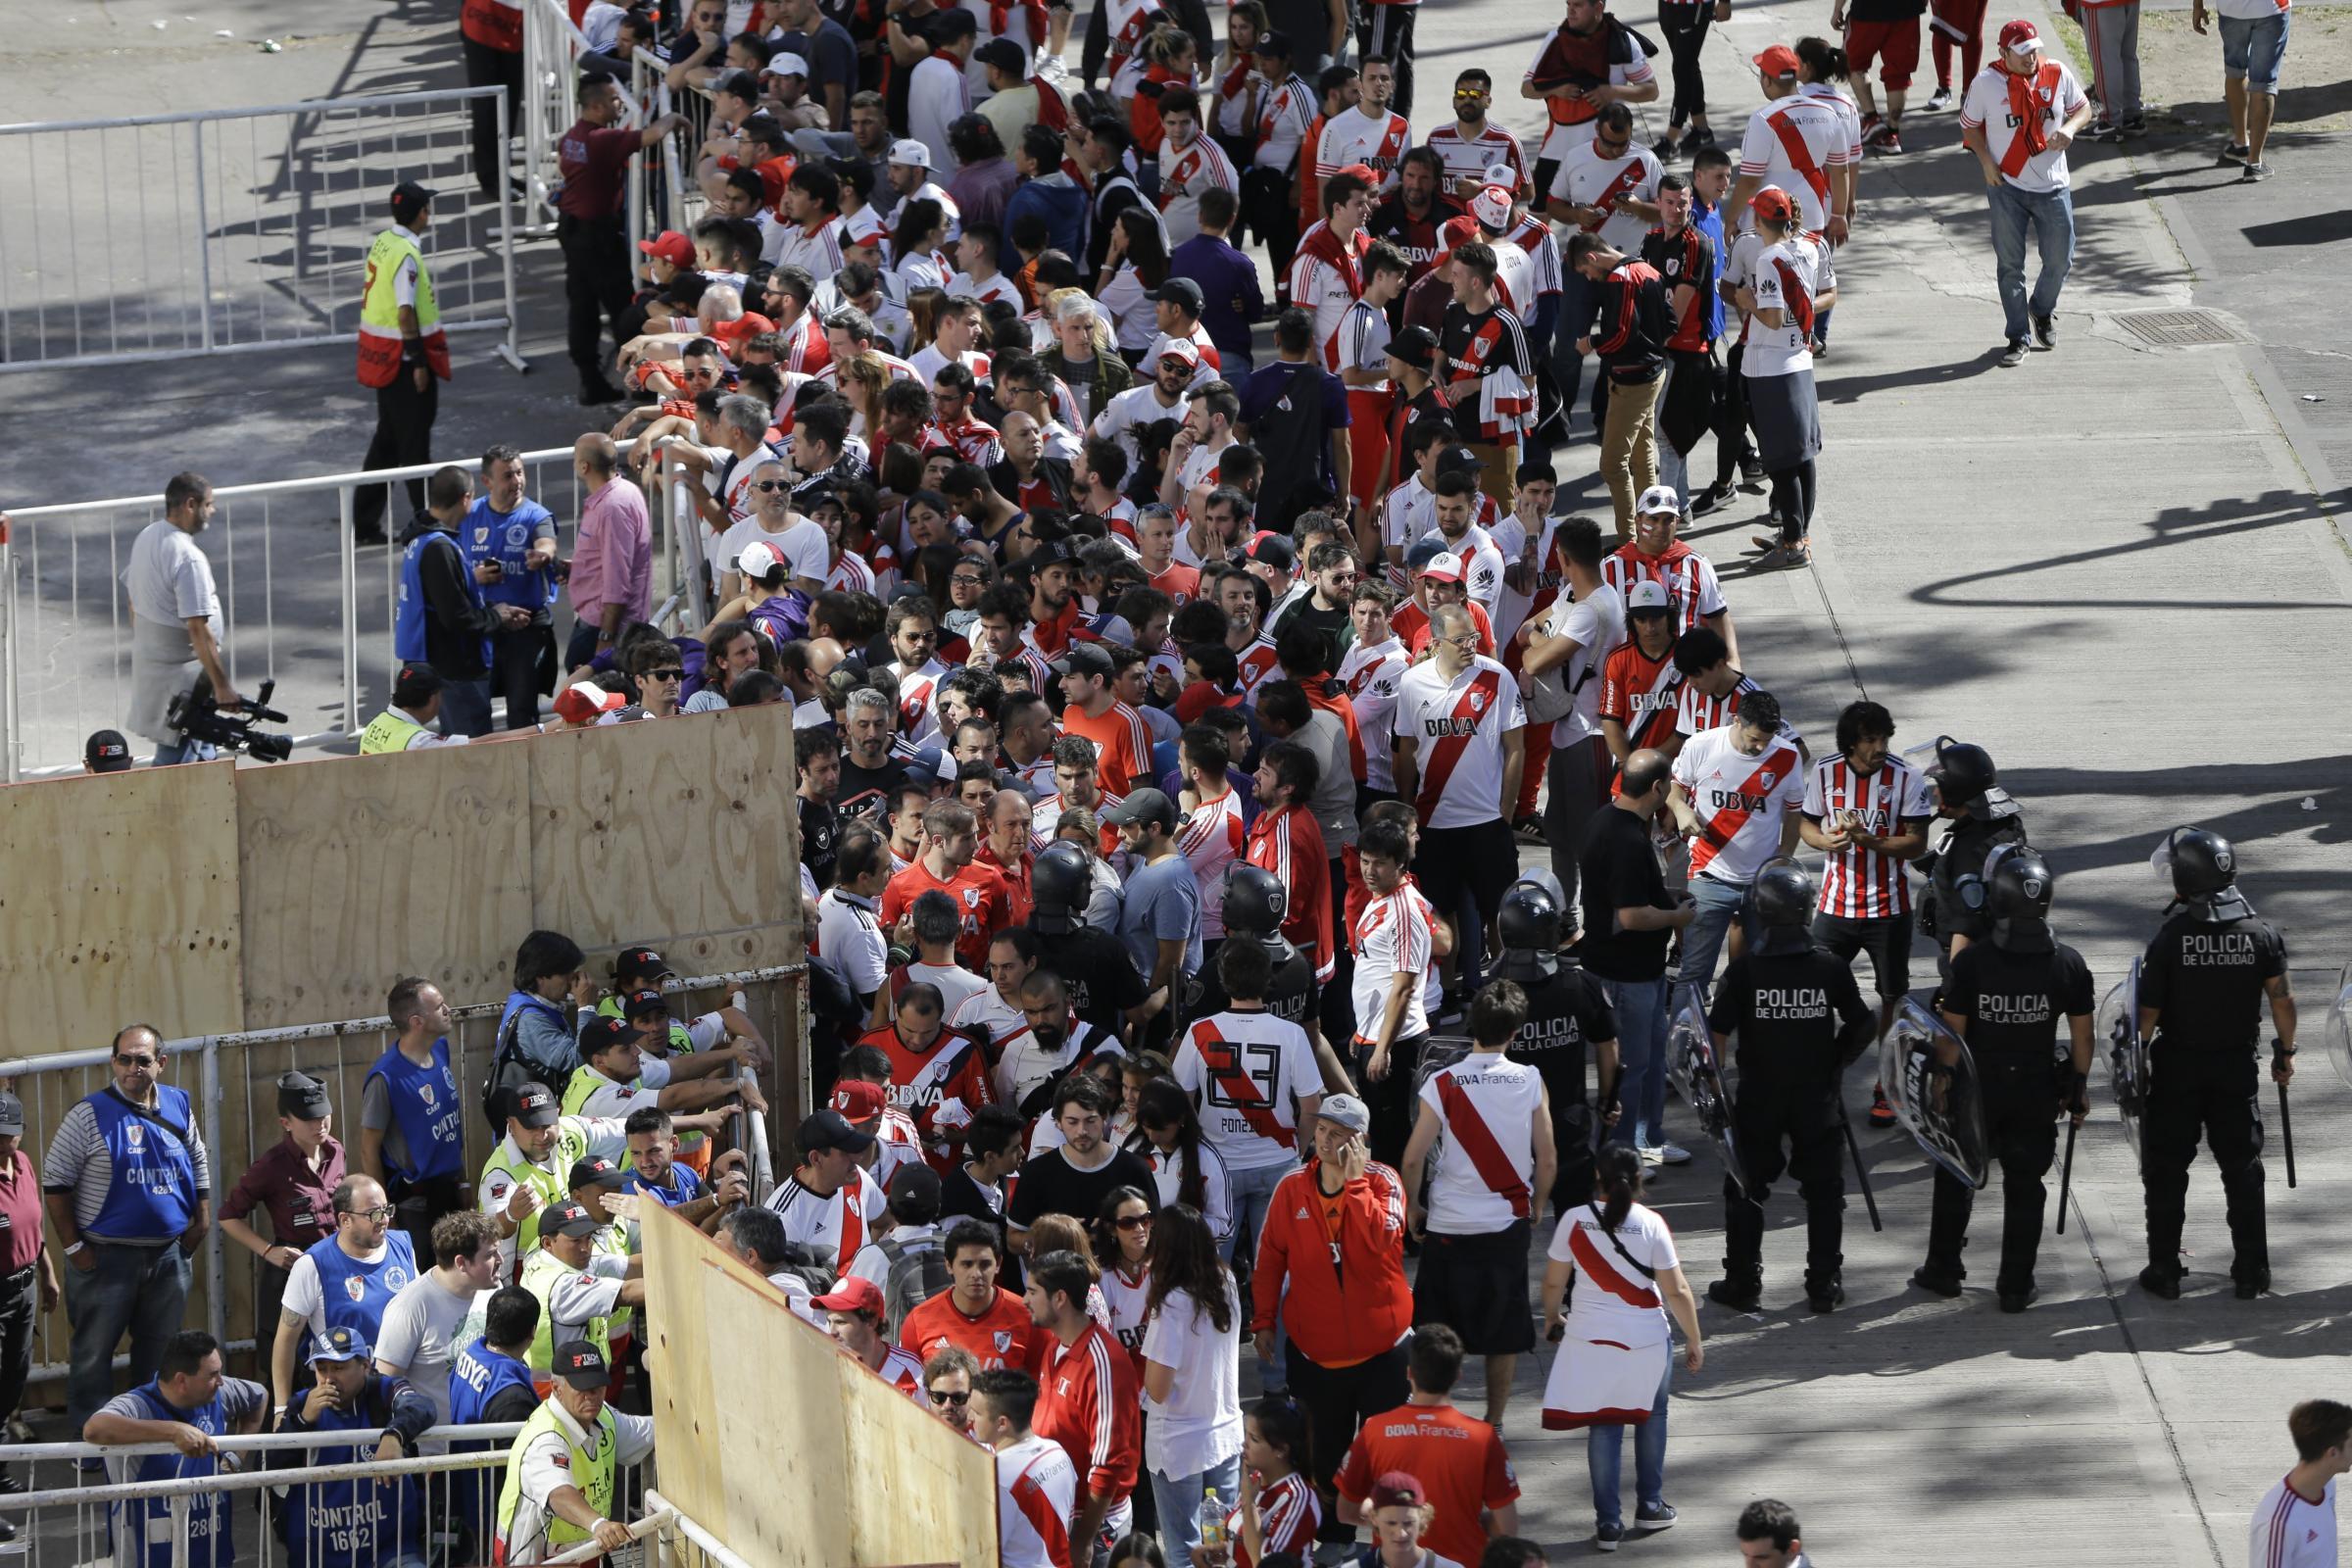 Copa Libertadores最终在对手球迷攻击Boca车队后终止了比赛